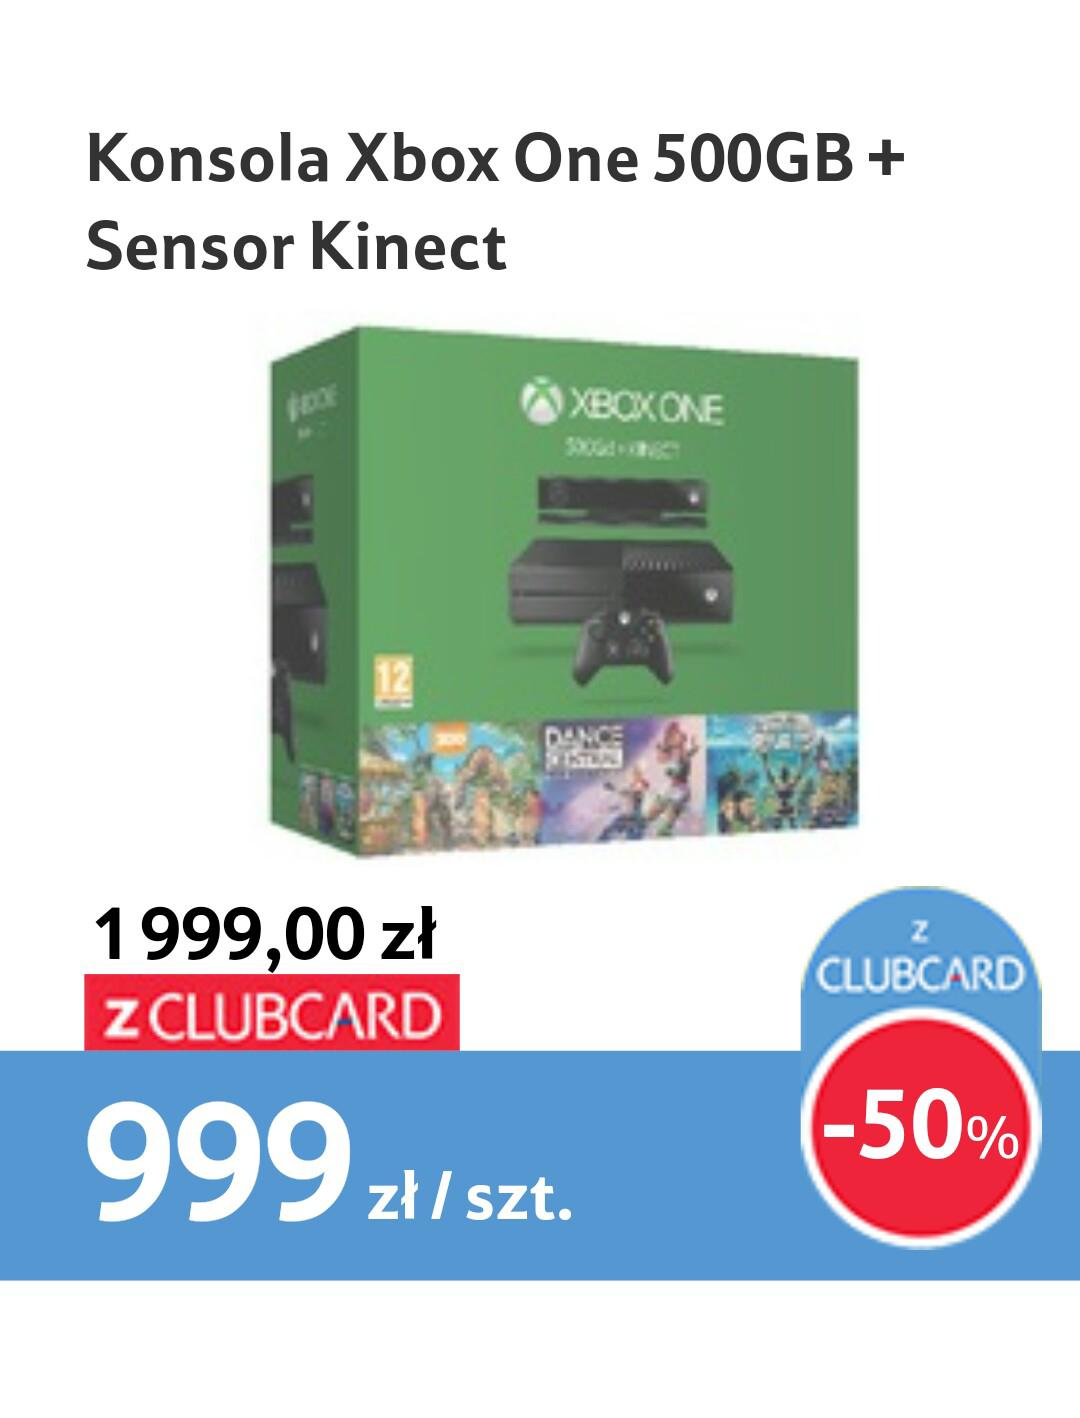 [BLACK FRIDAY] Xbox One + Kinect i 3 gry + 3 Miesiące GOLD